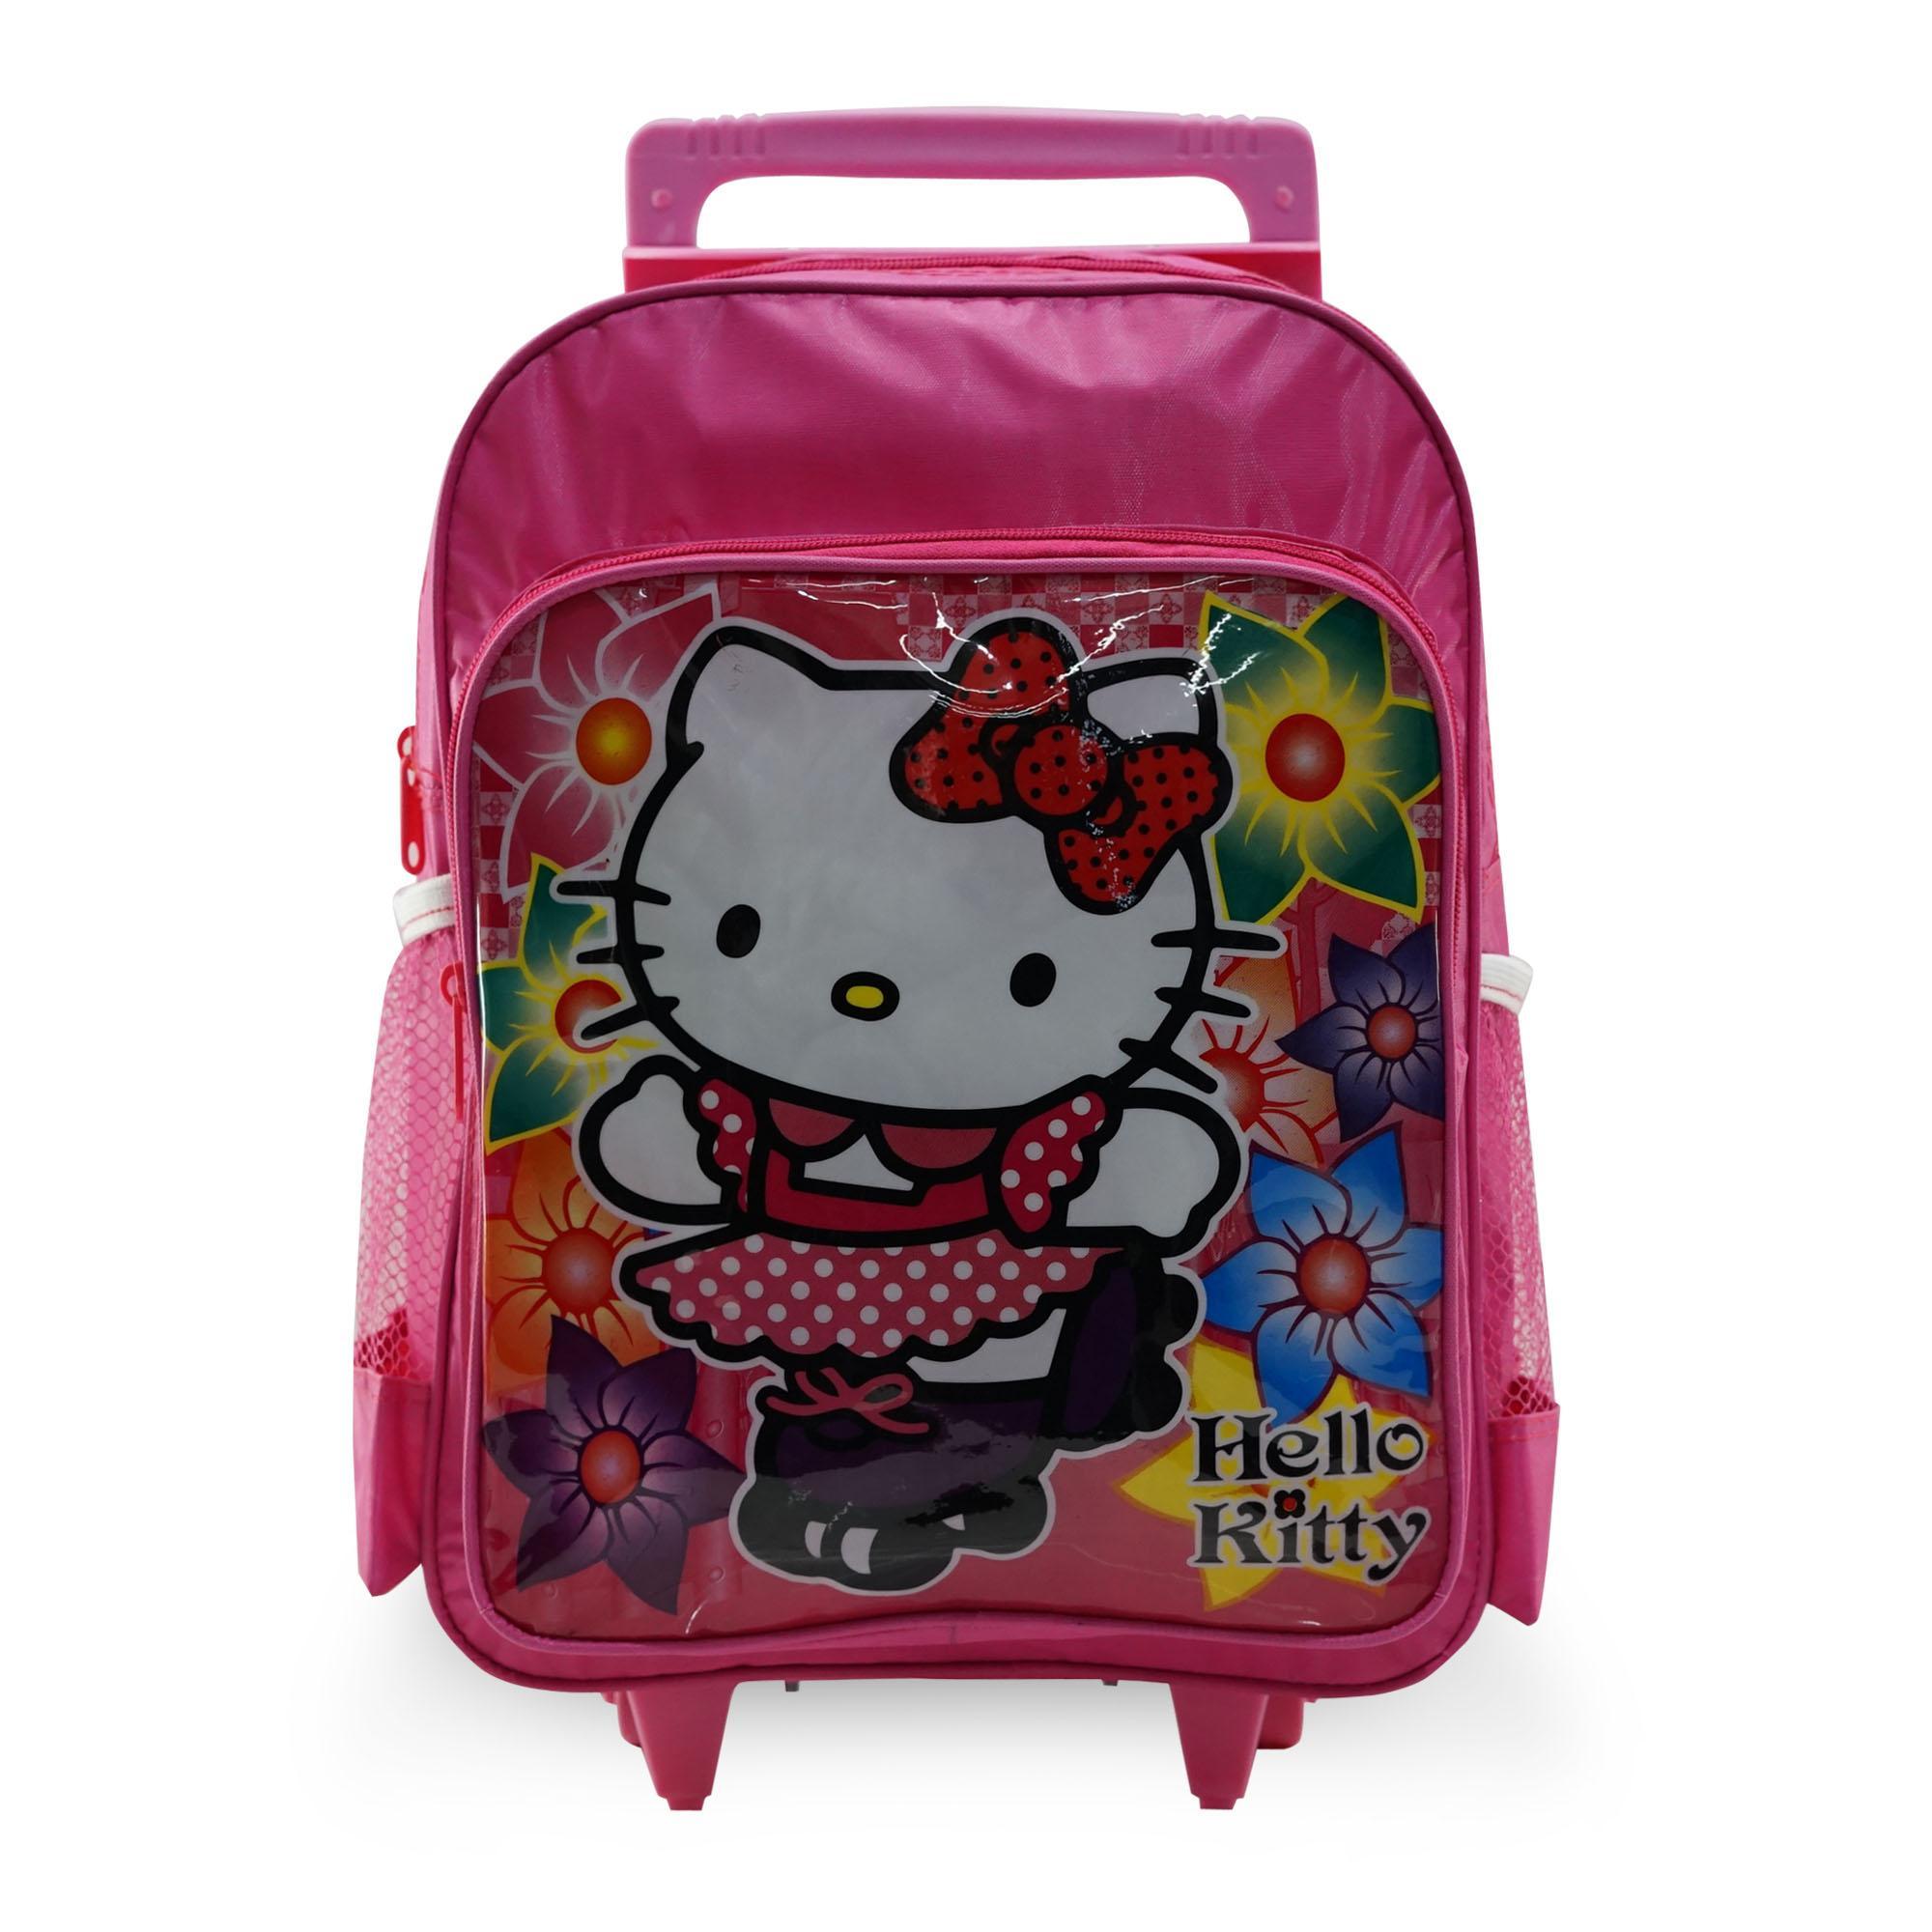 Tas Ransel Anak Sekolah Play Group Tahan Air Karakter Anak Hello Kitty 14 Inch By Indo Jaya Bags.